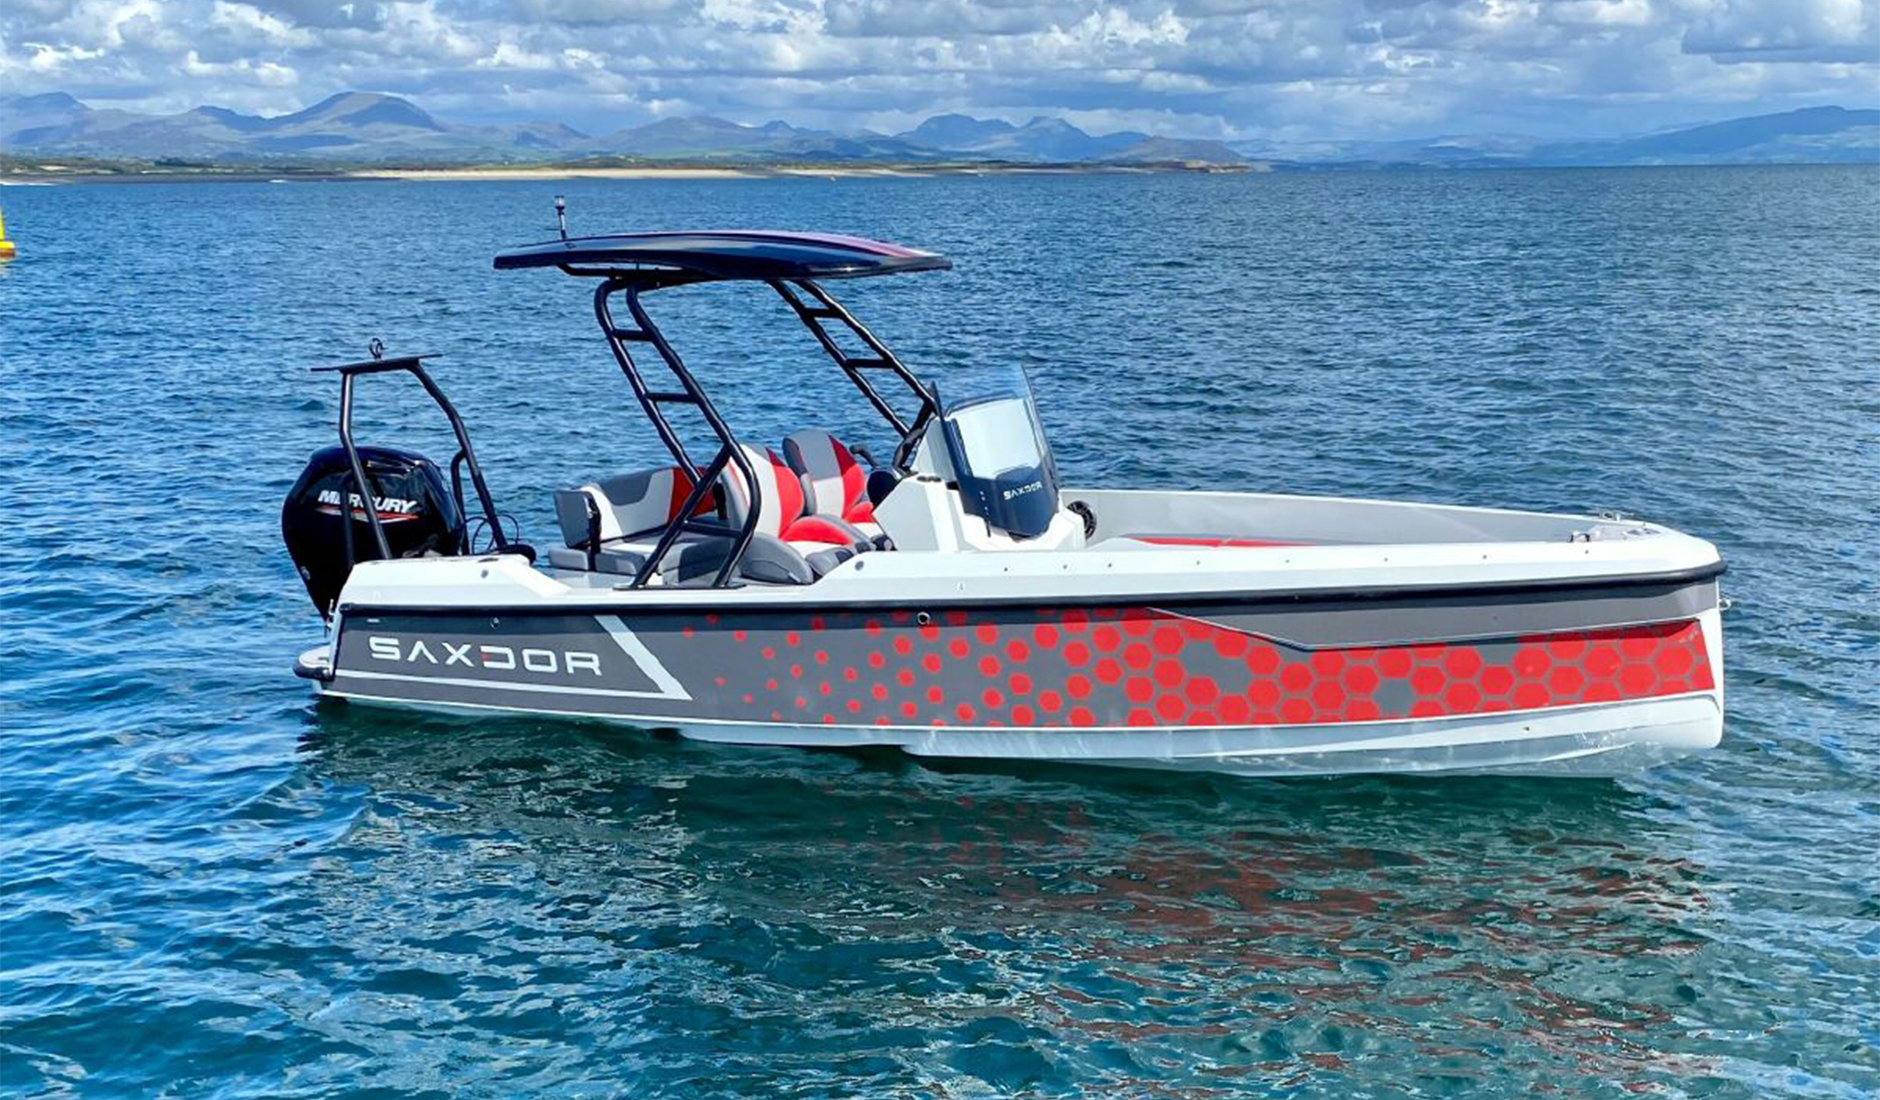 Saxdor 200 Sport Фото № 2